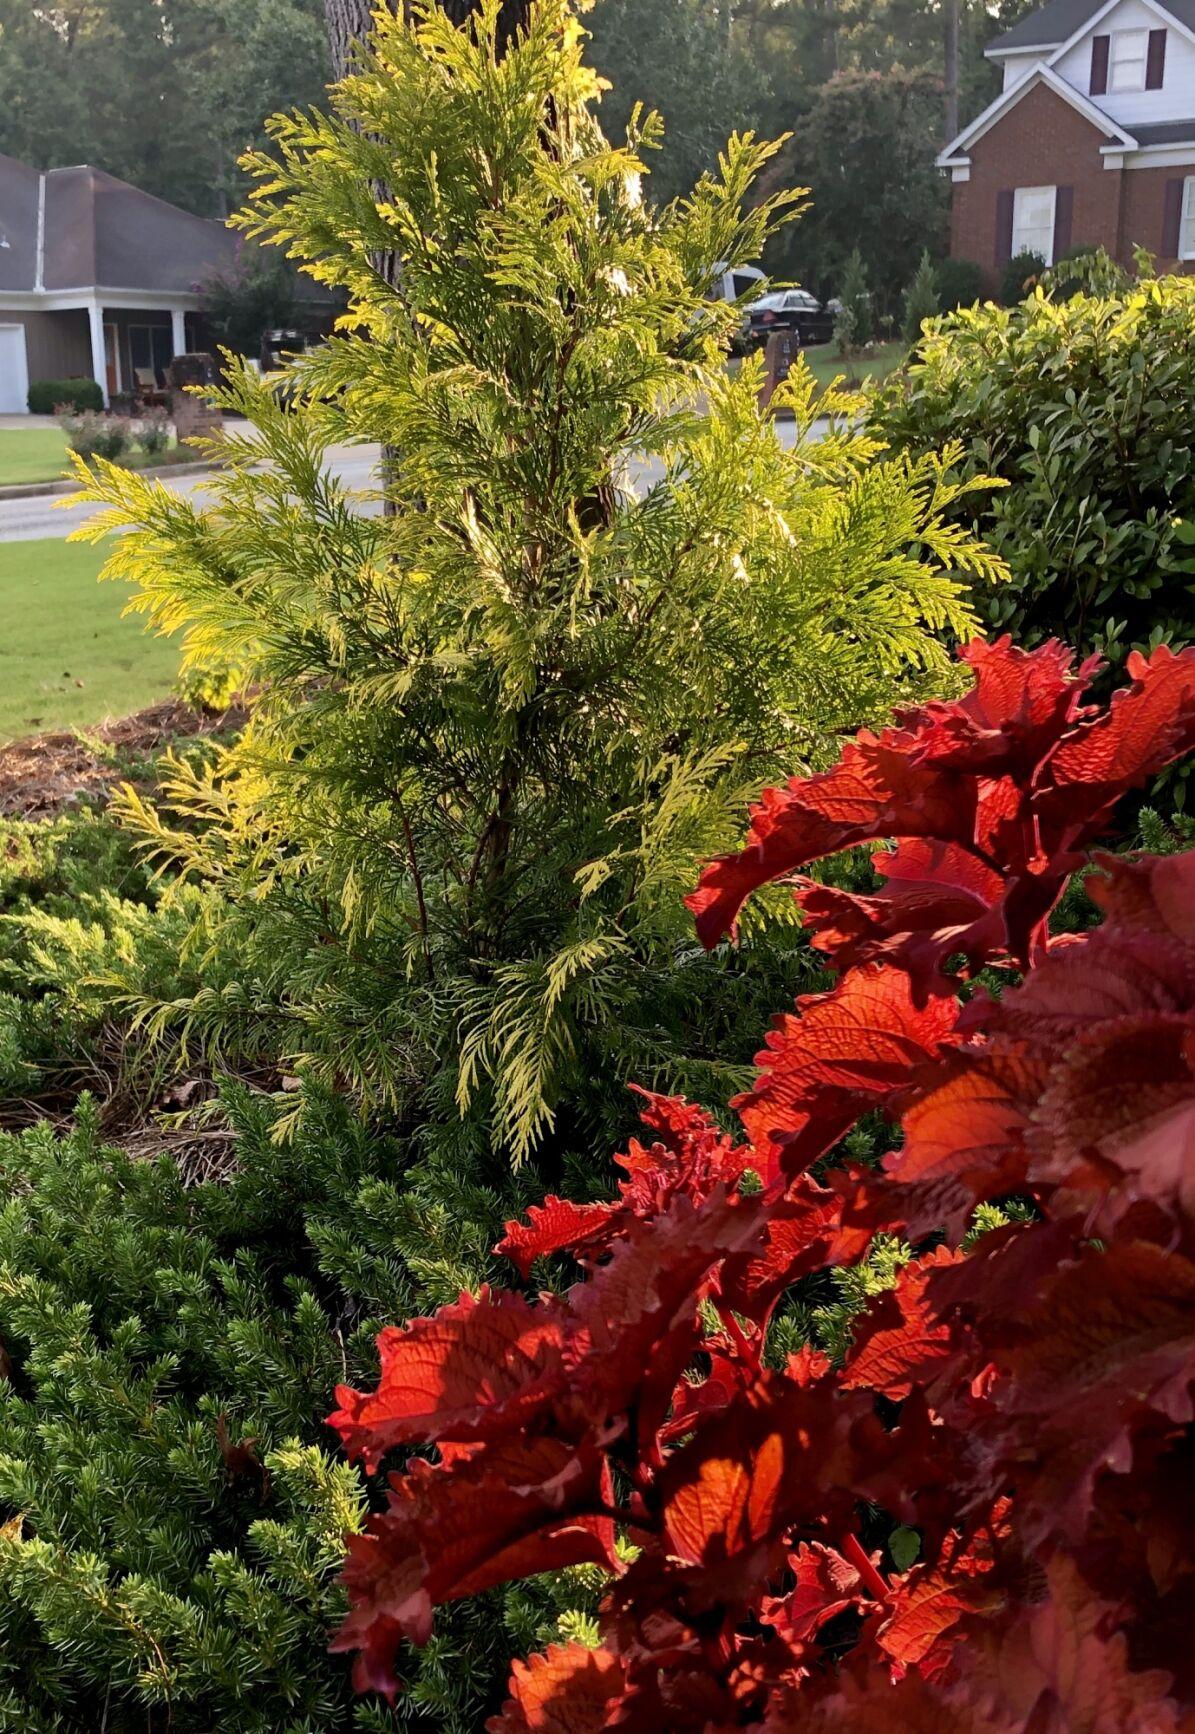 Gold tones of Fluffy conifers make the landscape sparkle